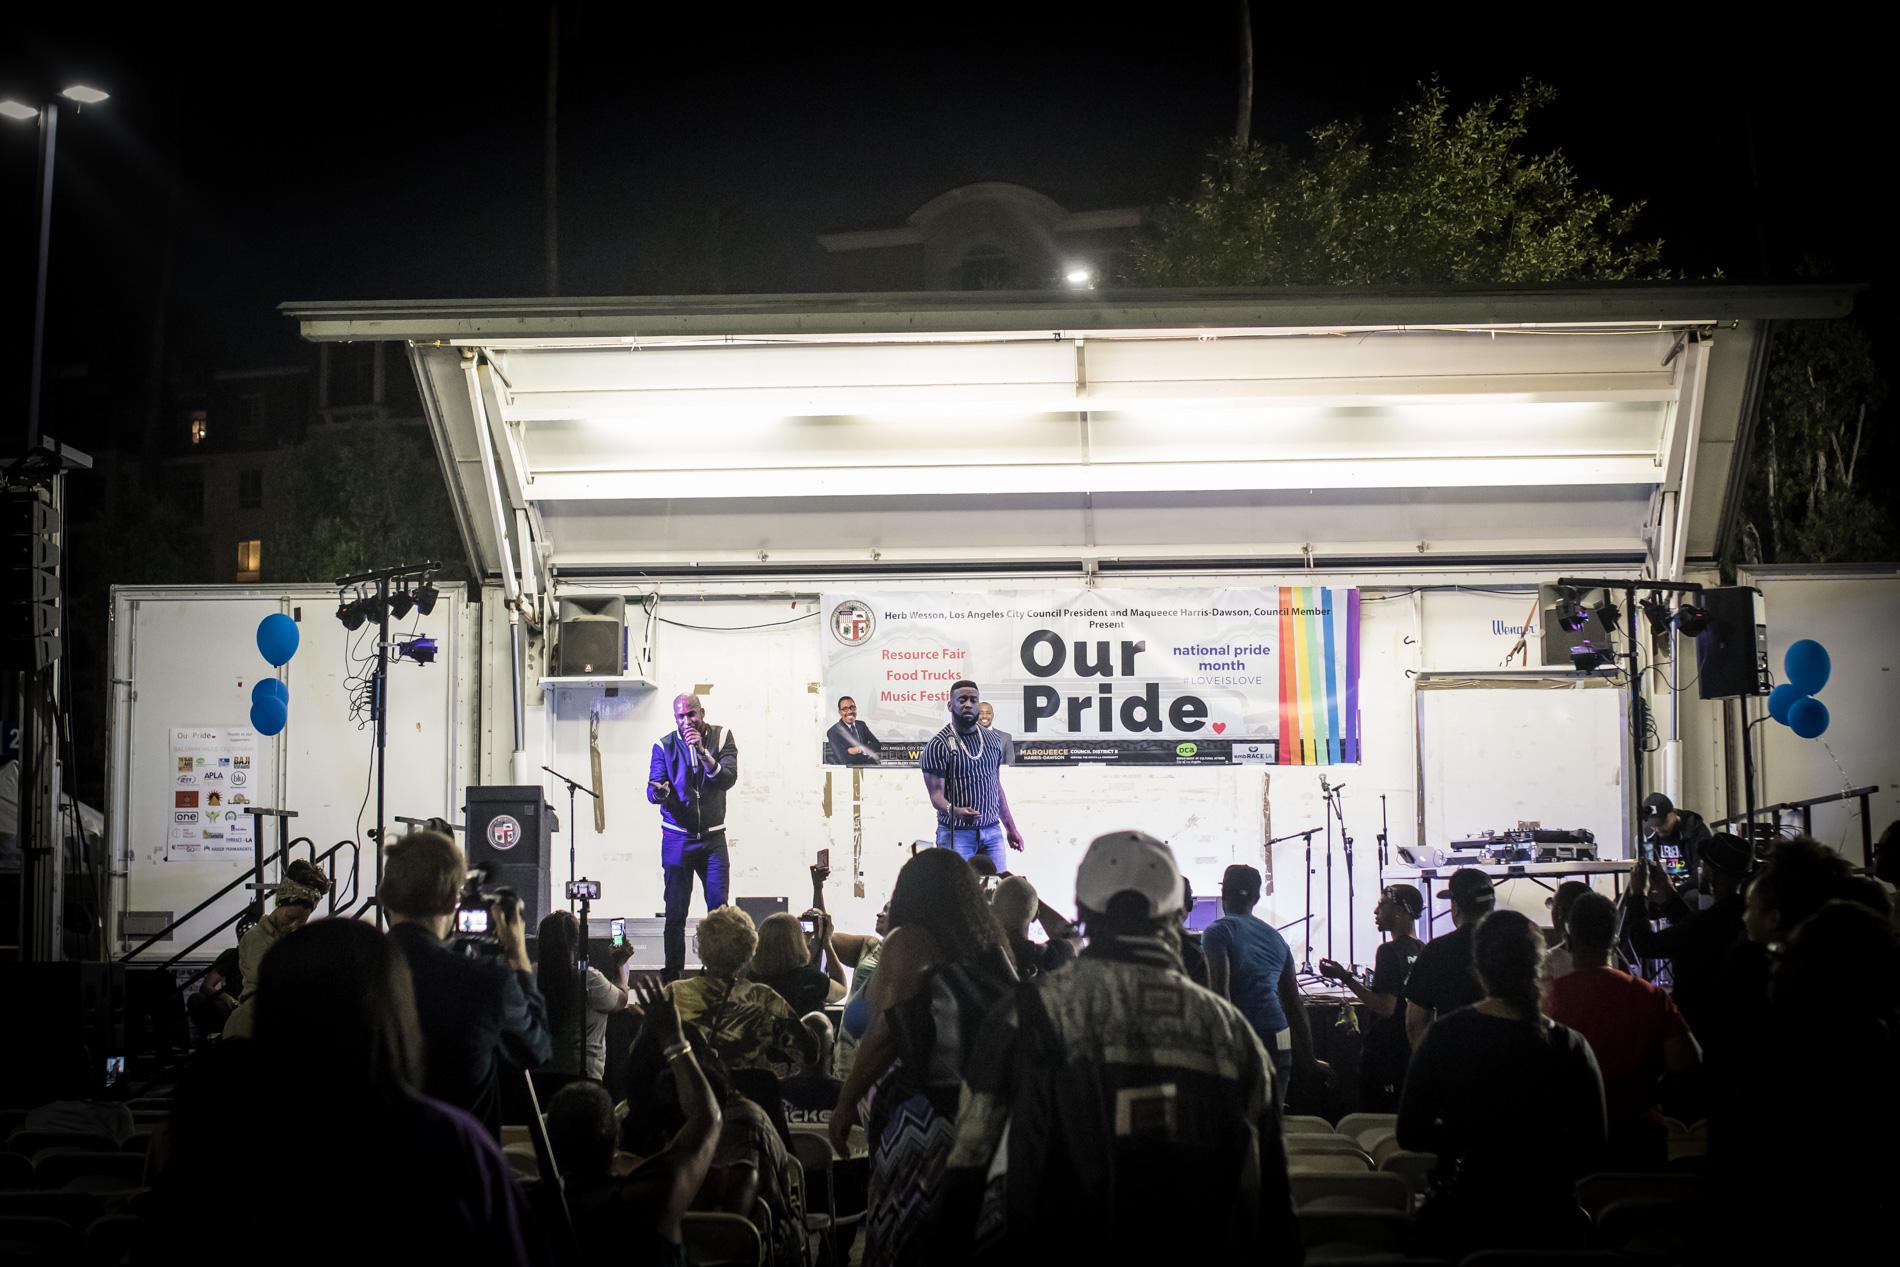 BHCP_LGBTQ Event 060818-217